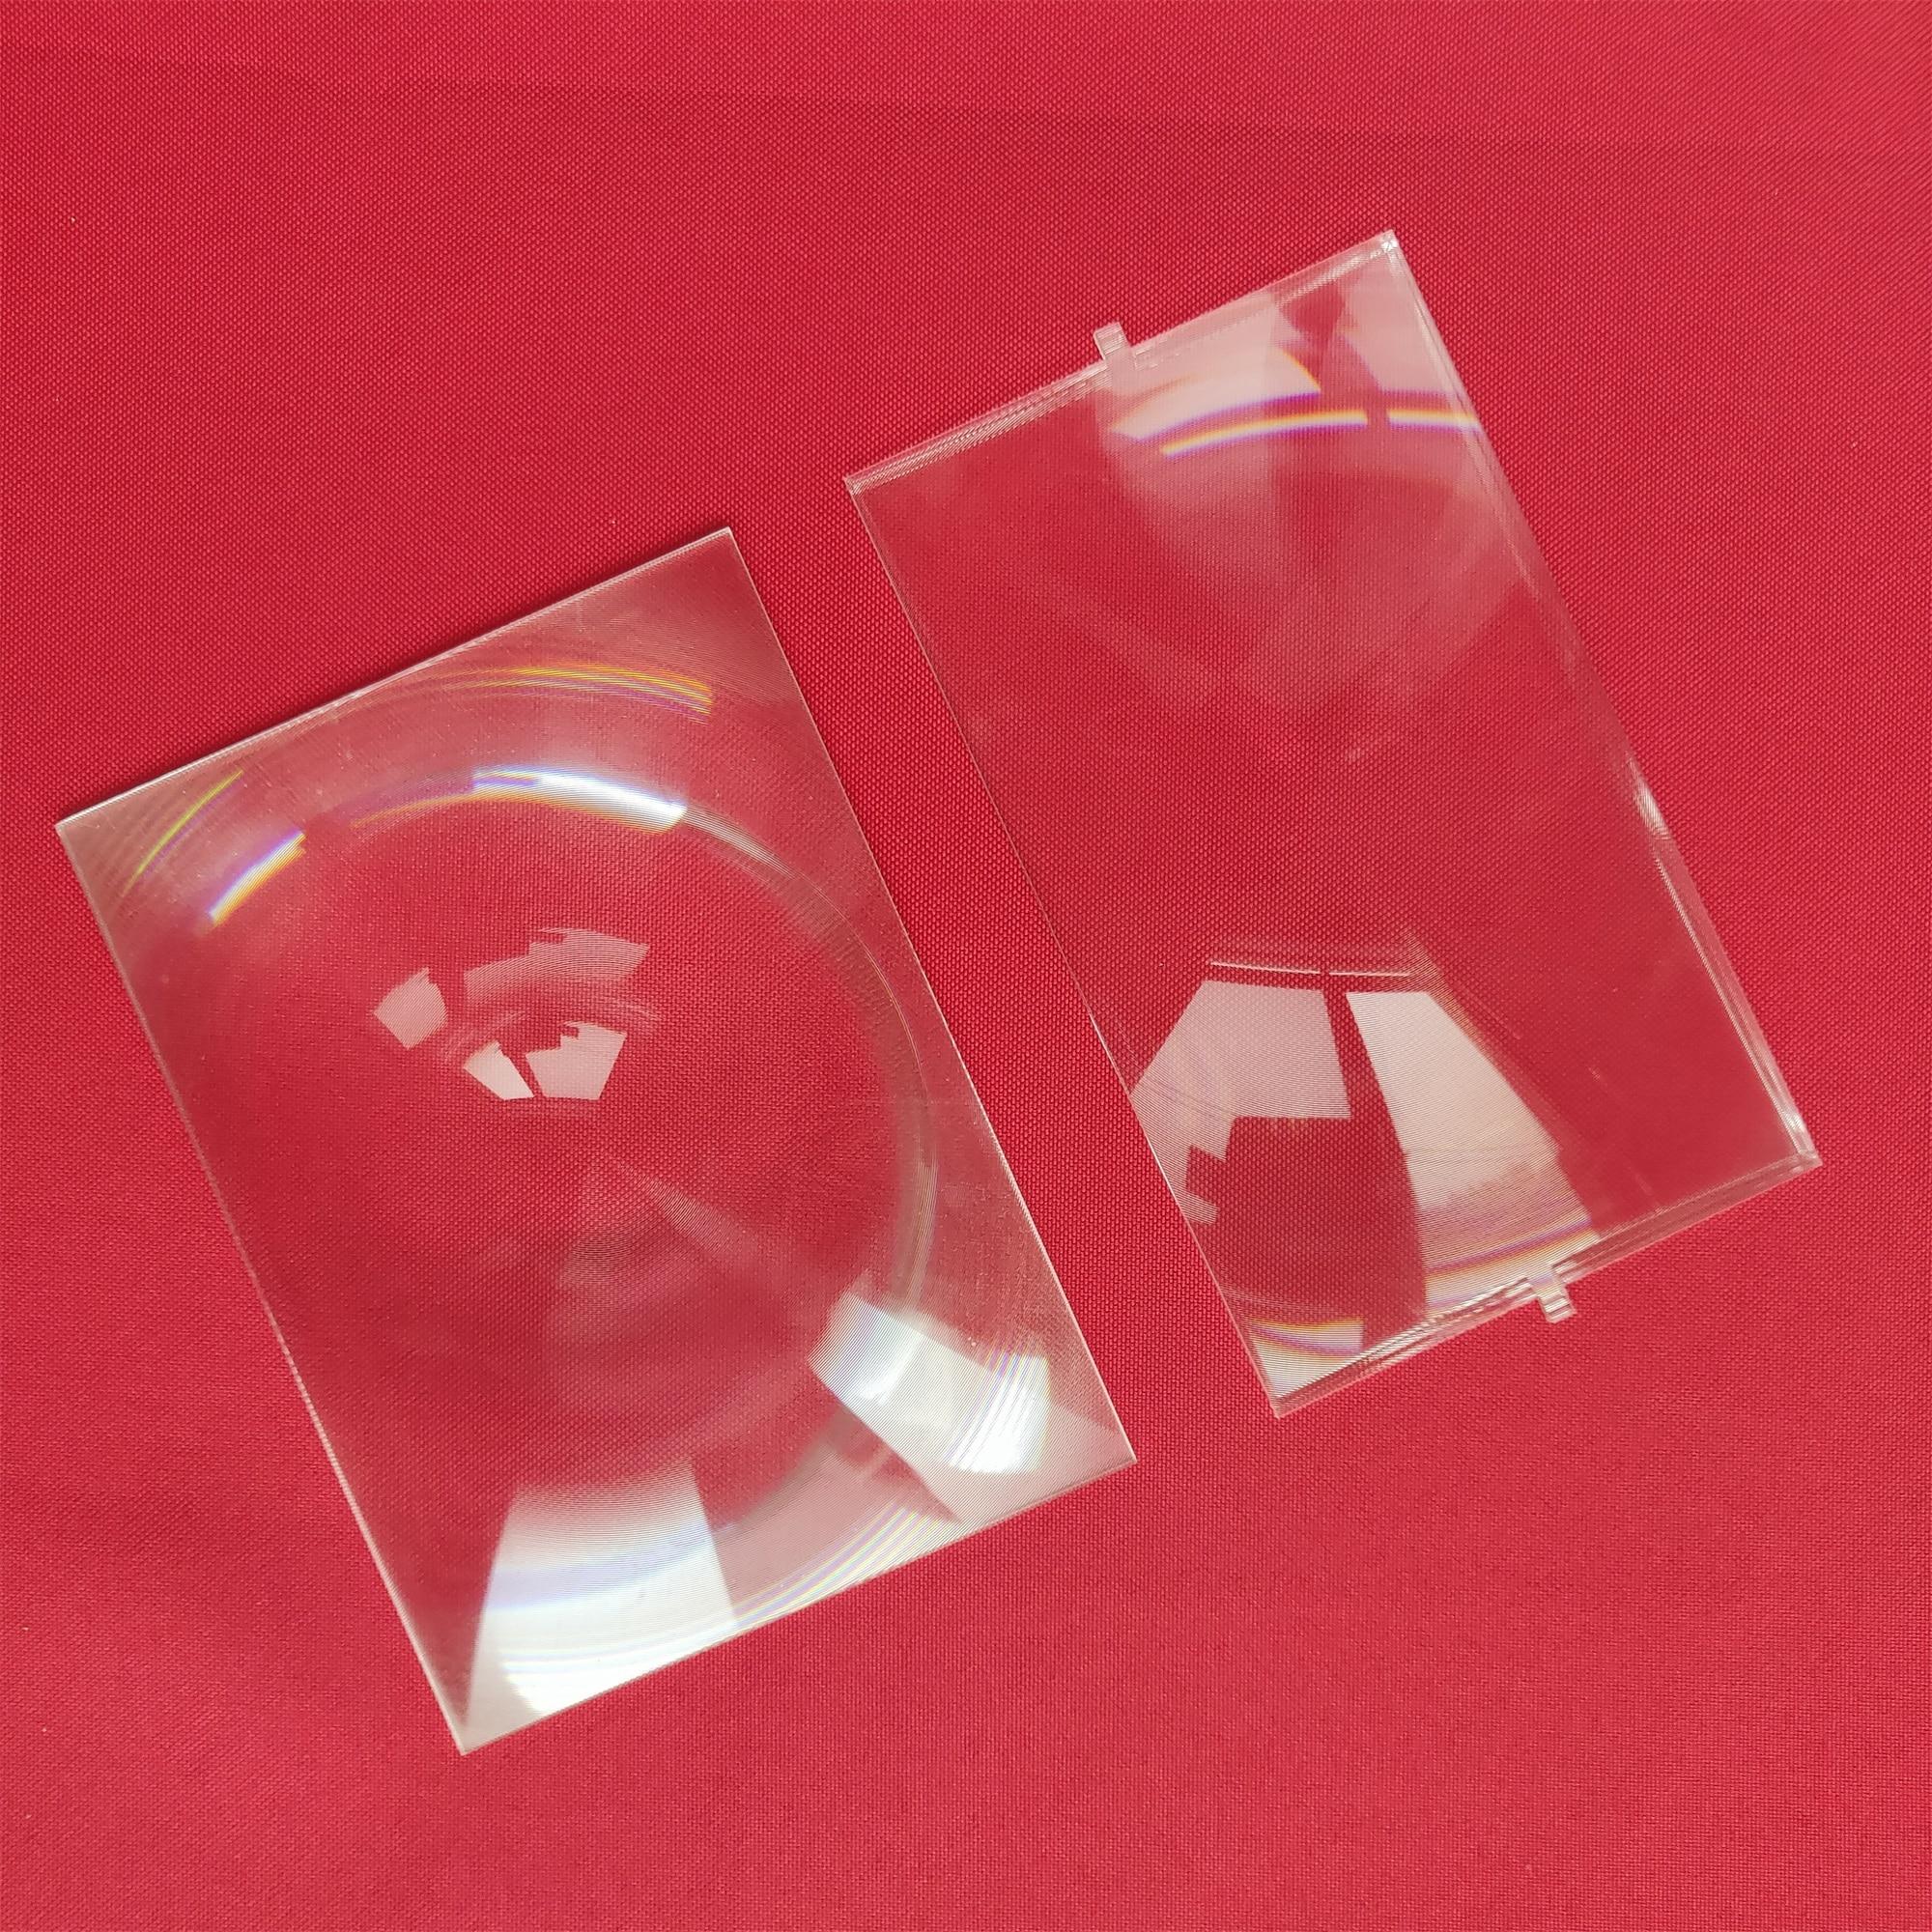 2 Pcs Fresnel Lens For 5.5 Inch LCD Front 148mm*82mm F185mm And Back 138mm*100mm F100mm DIY Projector Beamer Fresnel Lens Kit